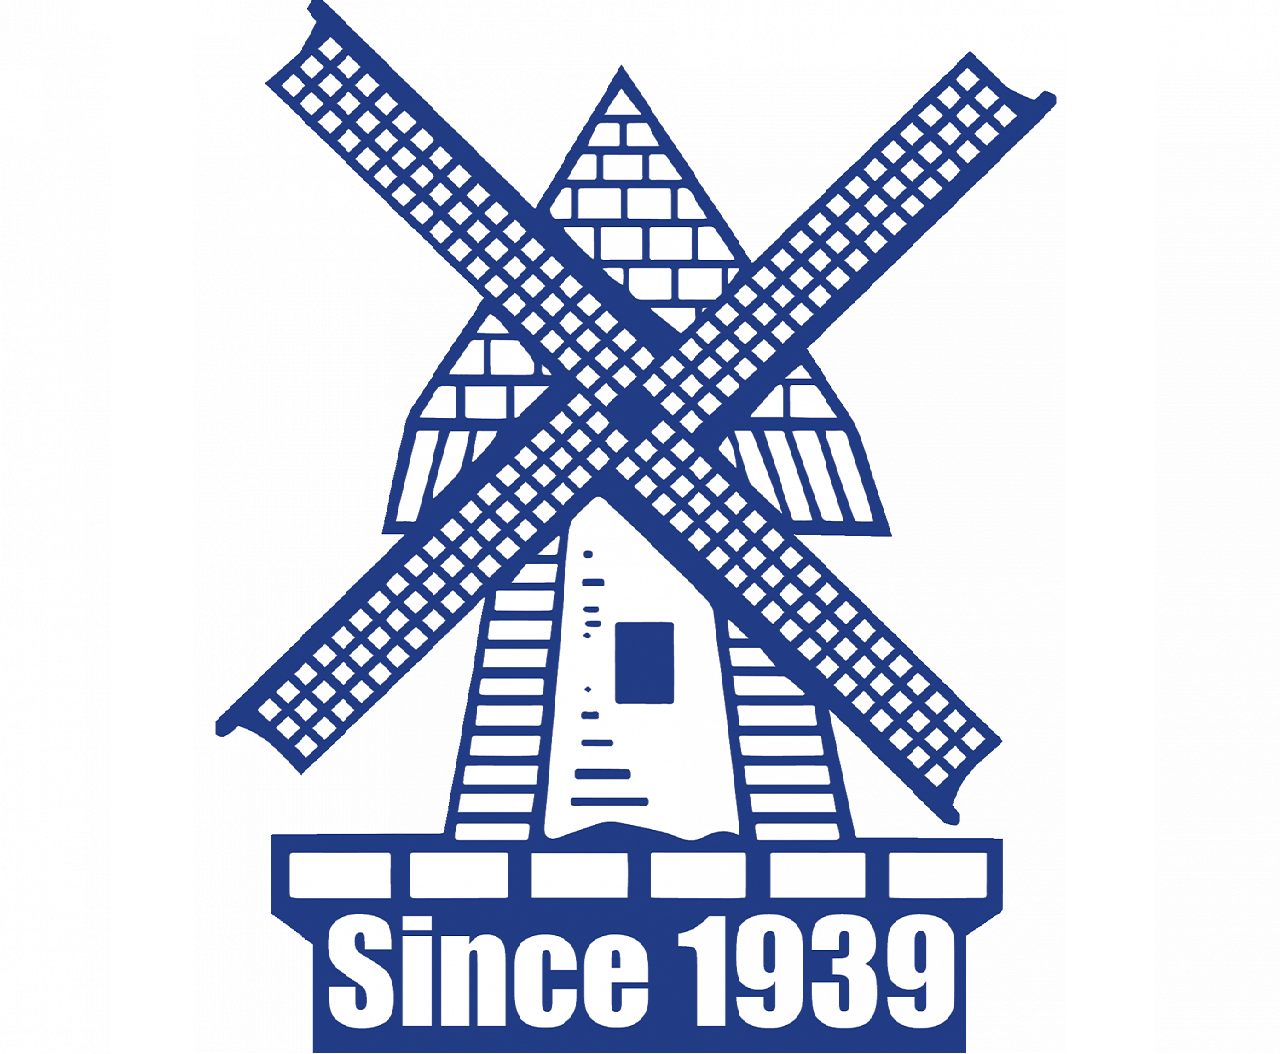 medium resolution of n14 celect cummins n14 celect price 5500 00